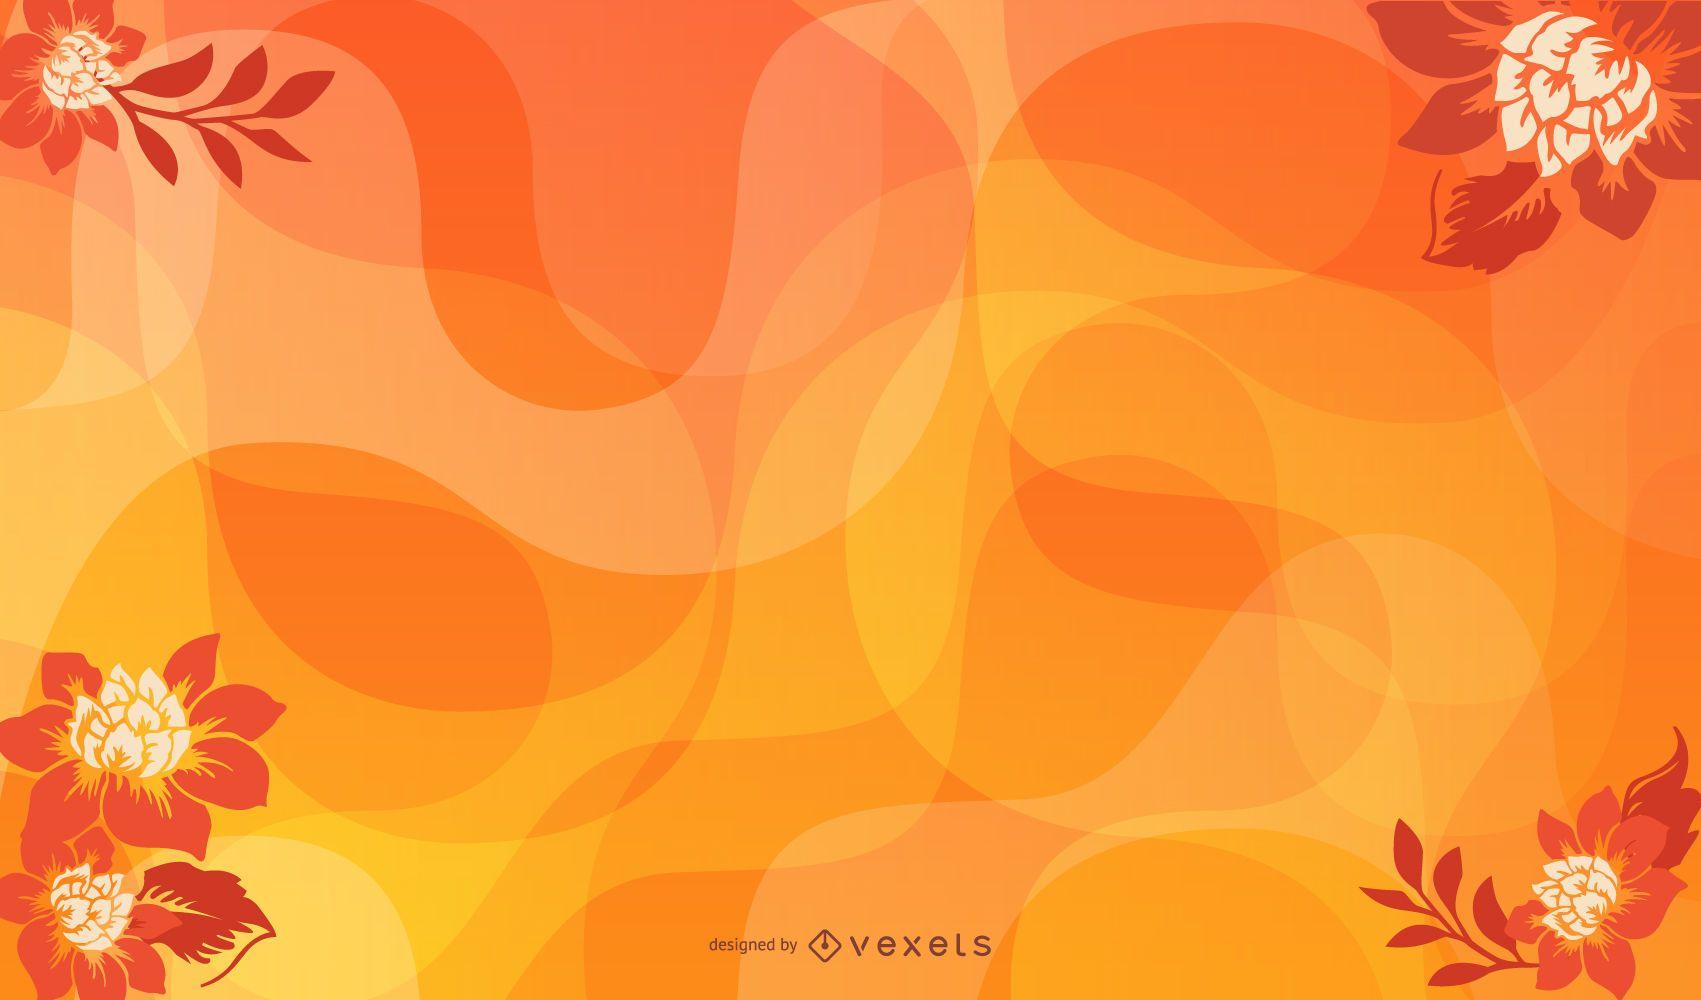 Fundo de flor abstrato laranja